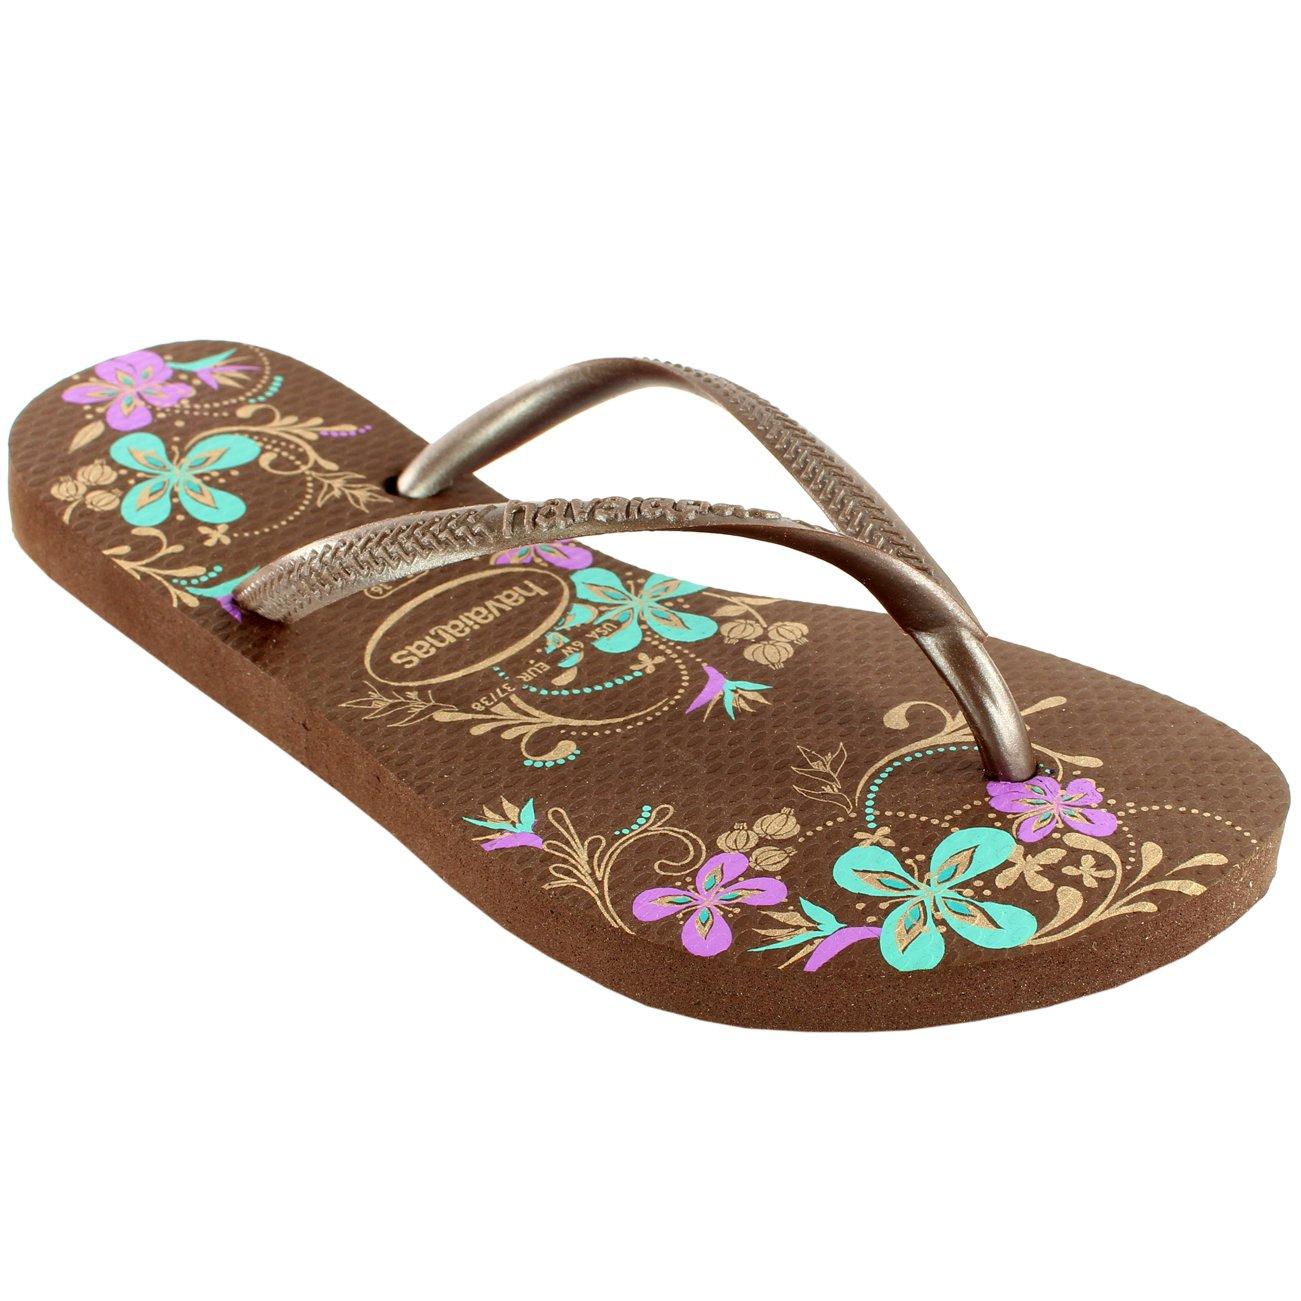 abd4d0c2a548da Havaianas Womens Slim Season Beach Flip Flops Summer Sandals New UK Sizes  1-8  Amazon.co.uk  Shoes   Bags